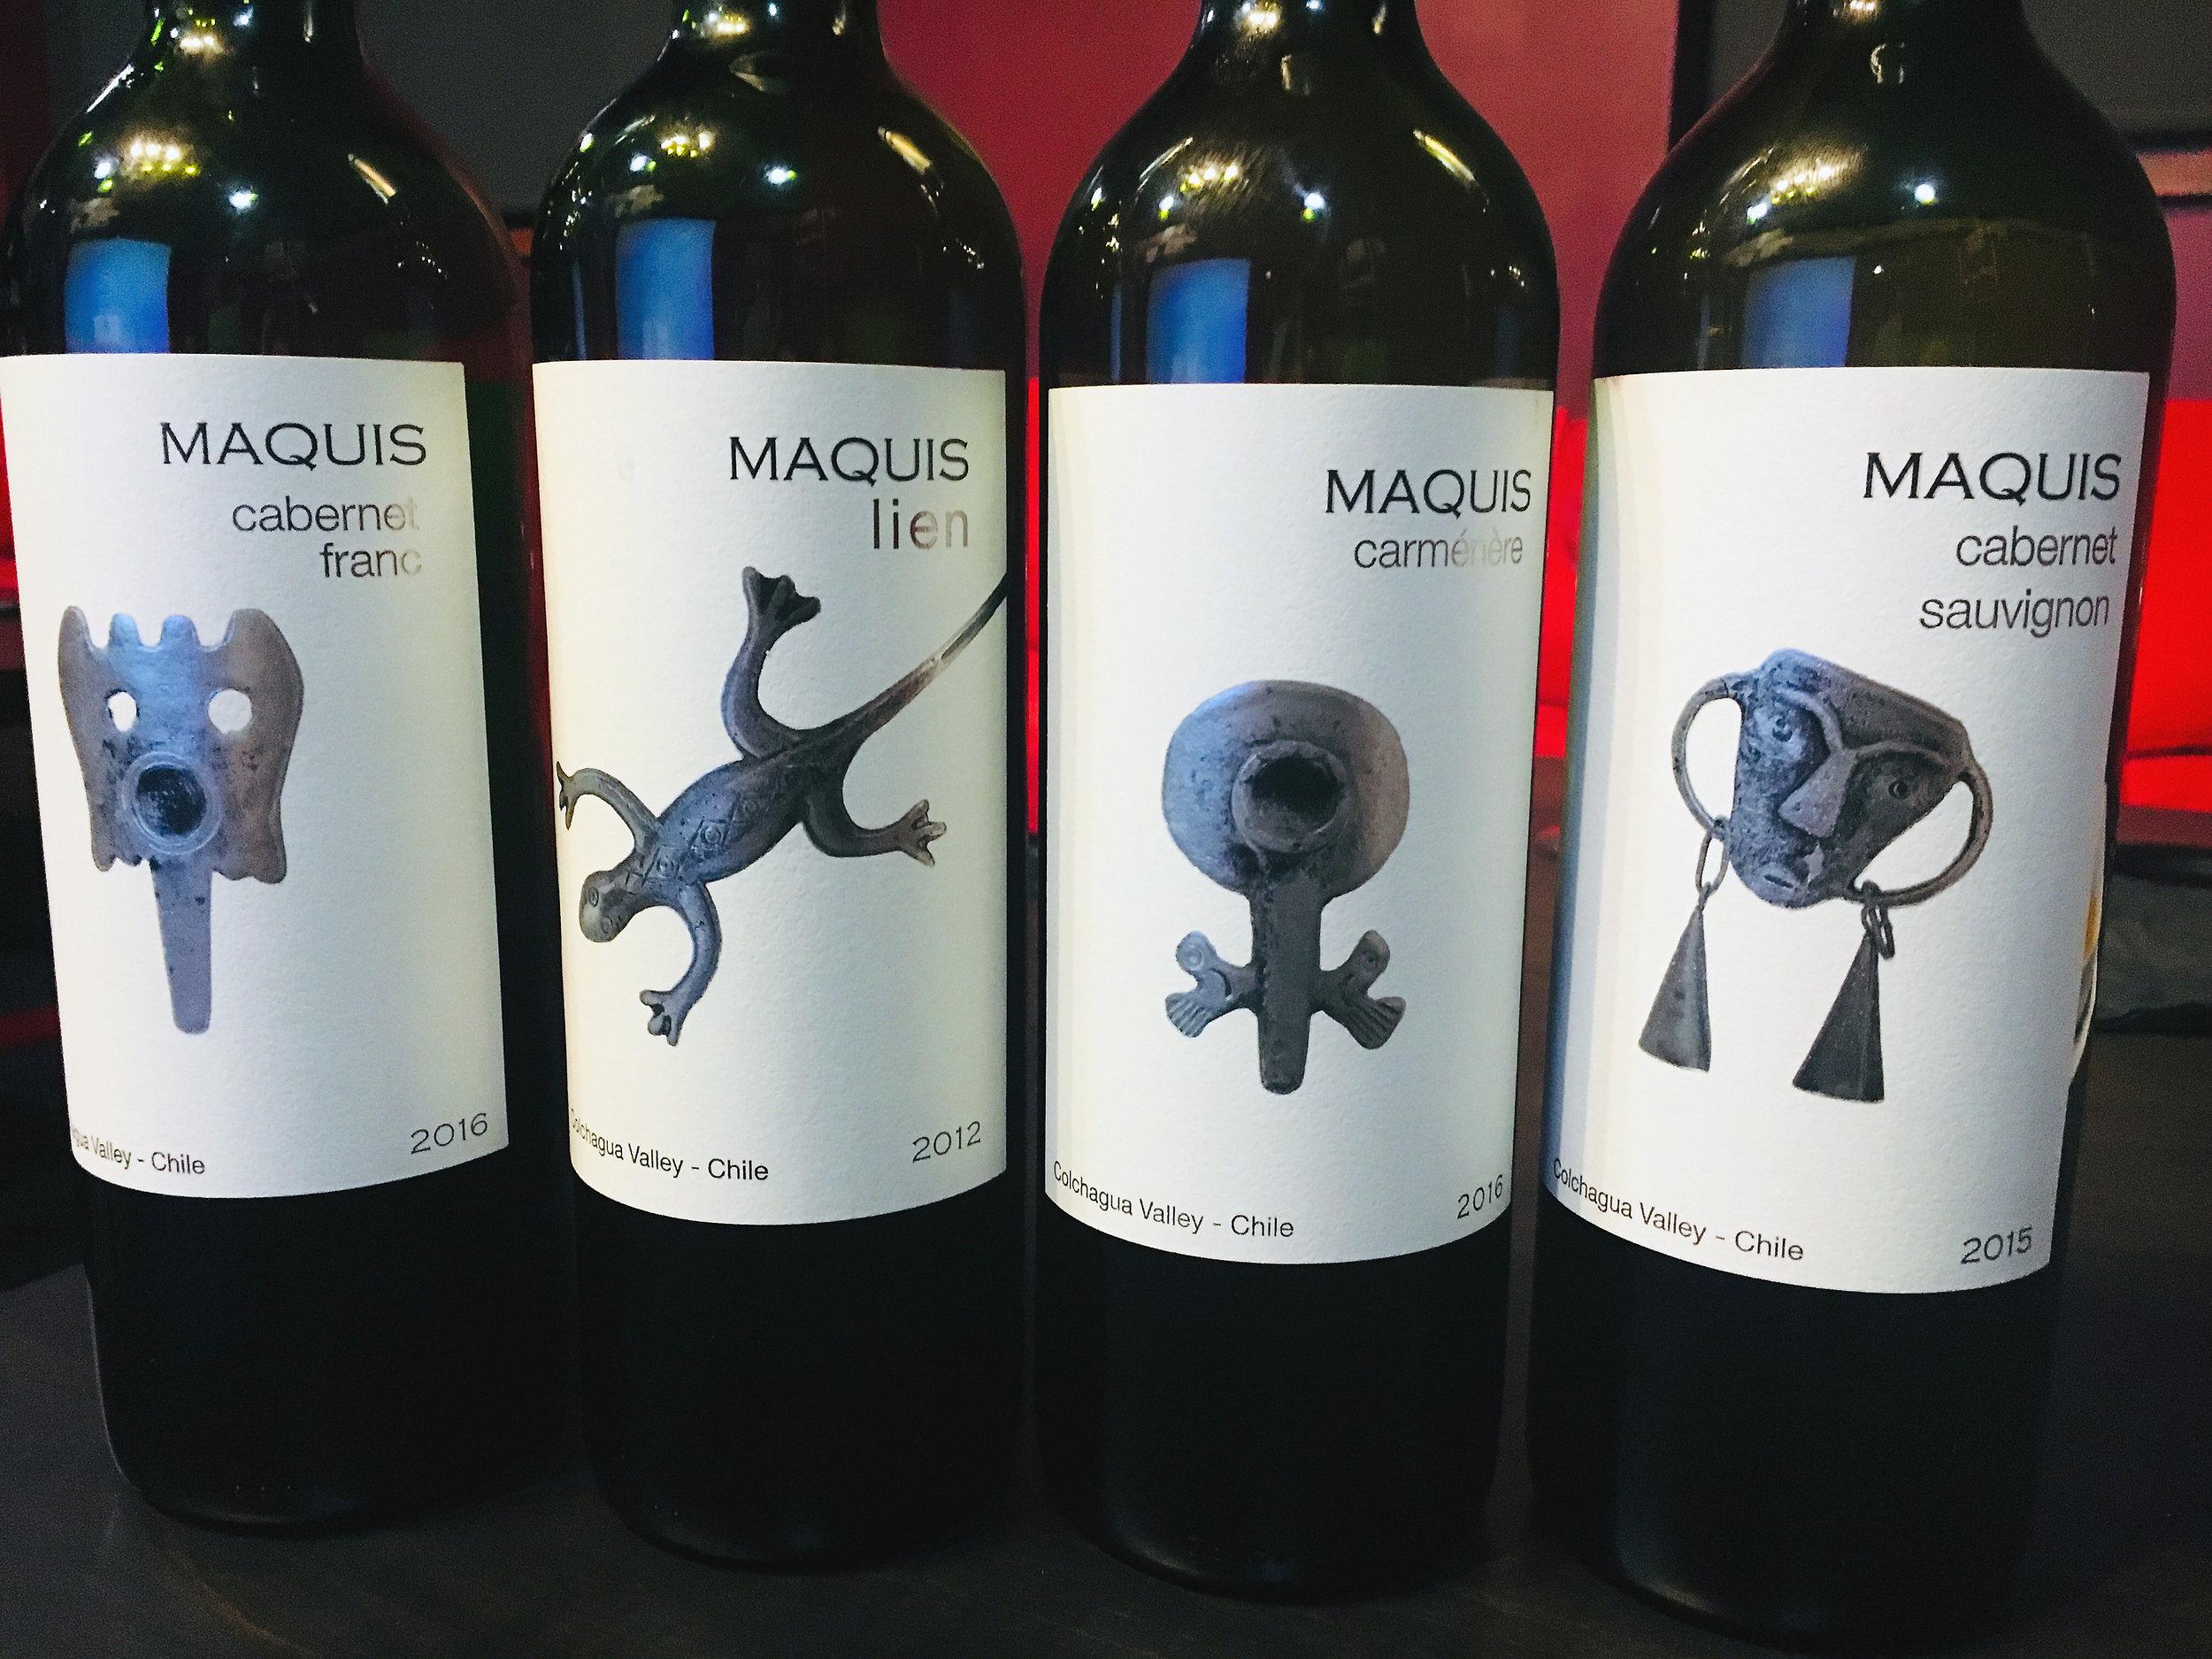 maquis_1.jpg